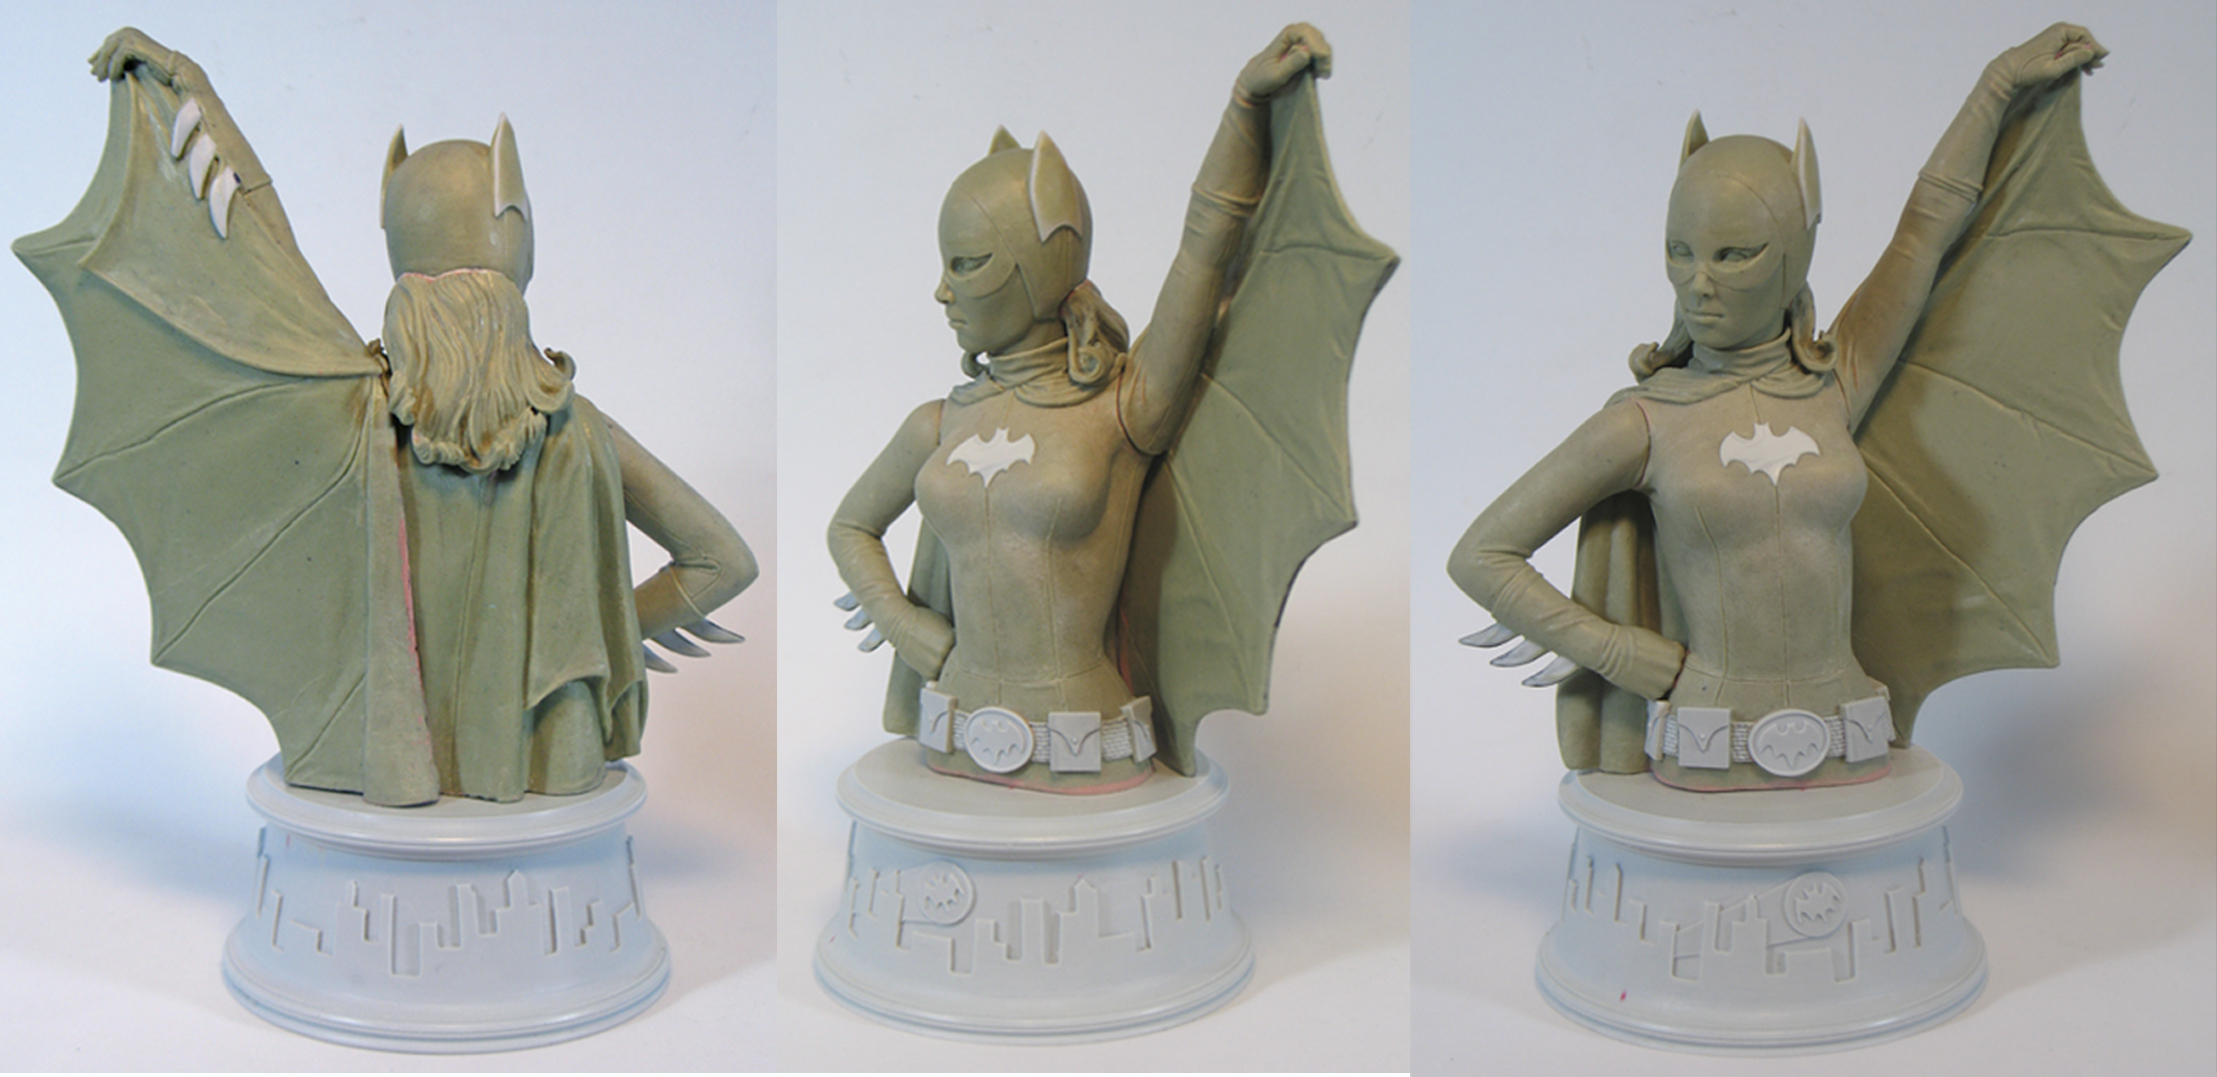 batgirl-rev1